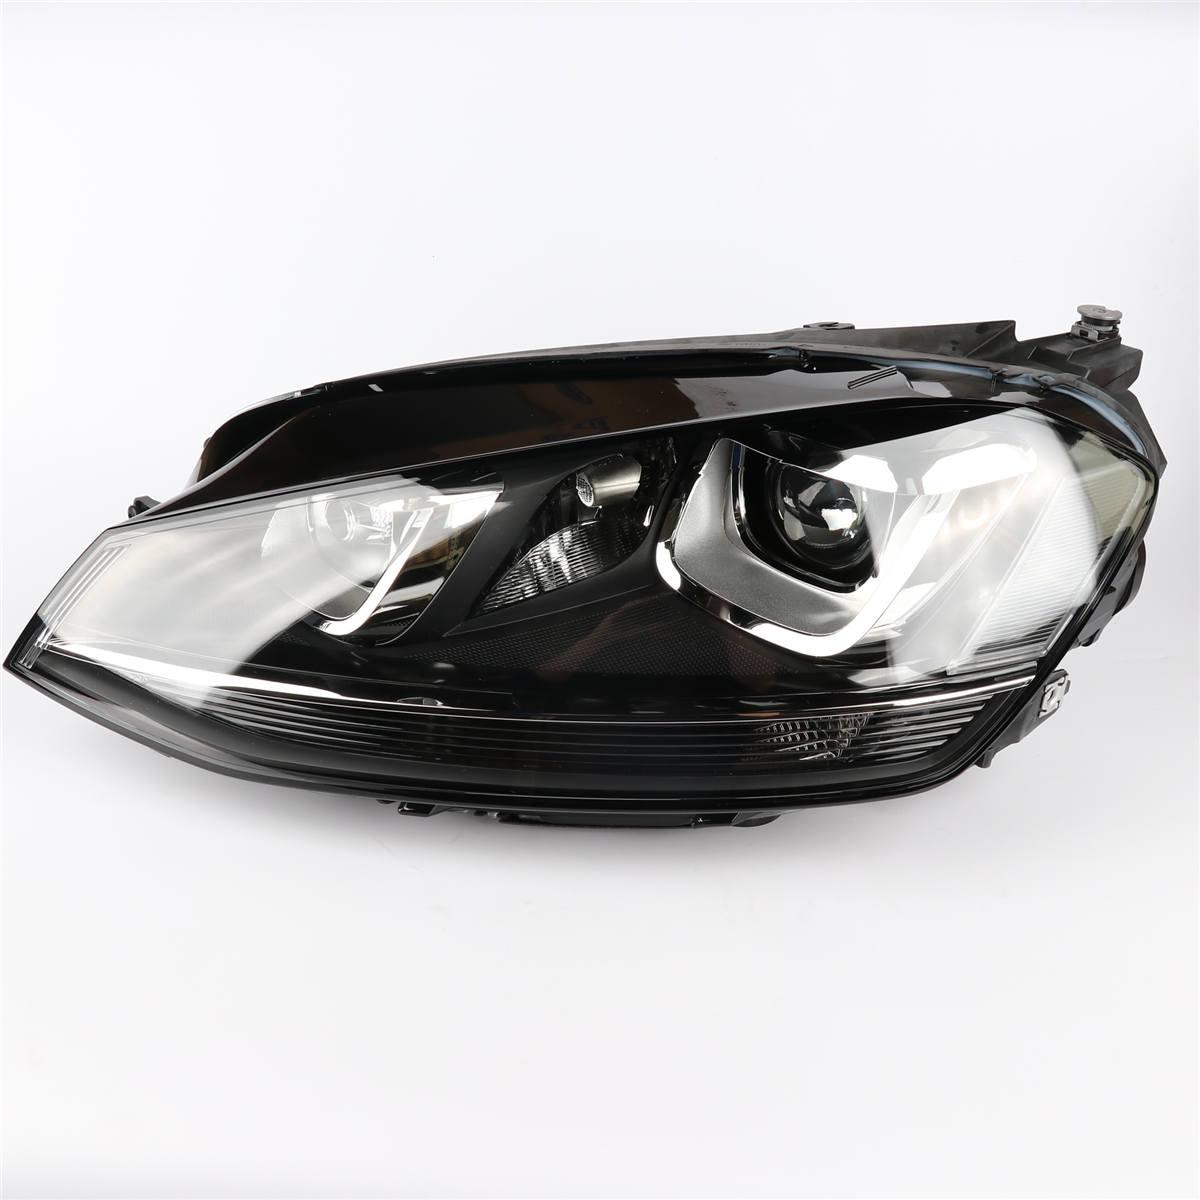 1Pcs Genuine Front Headlight Head Light Lamp Assembly Right Side For VW Golf MK7 L5GG 941 032 цены